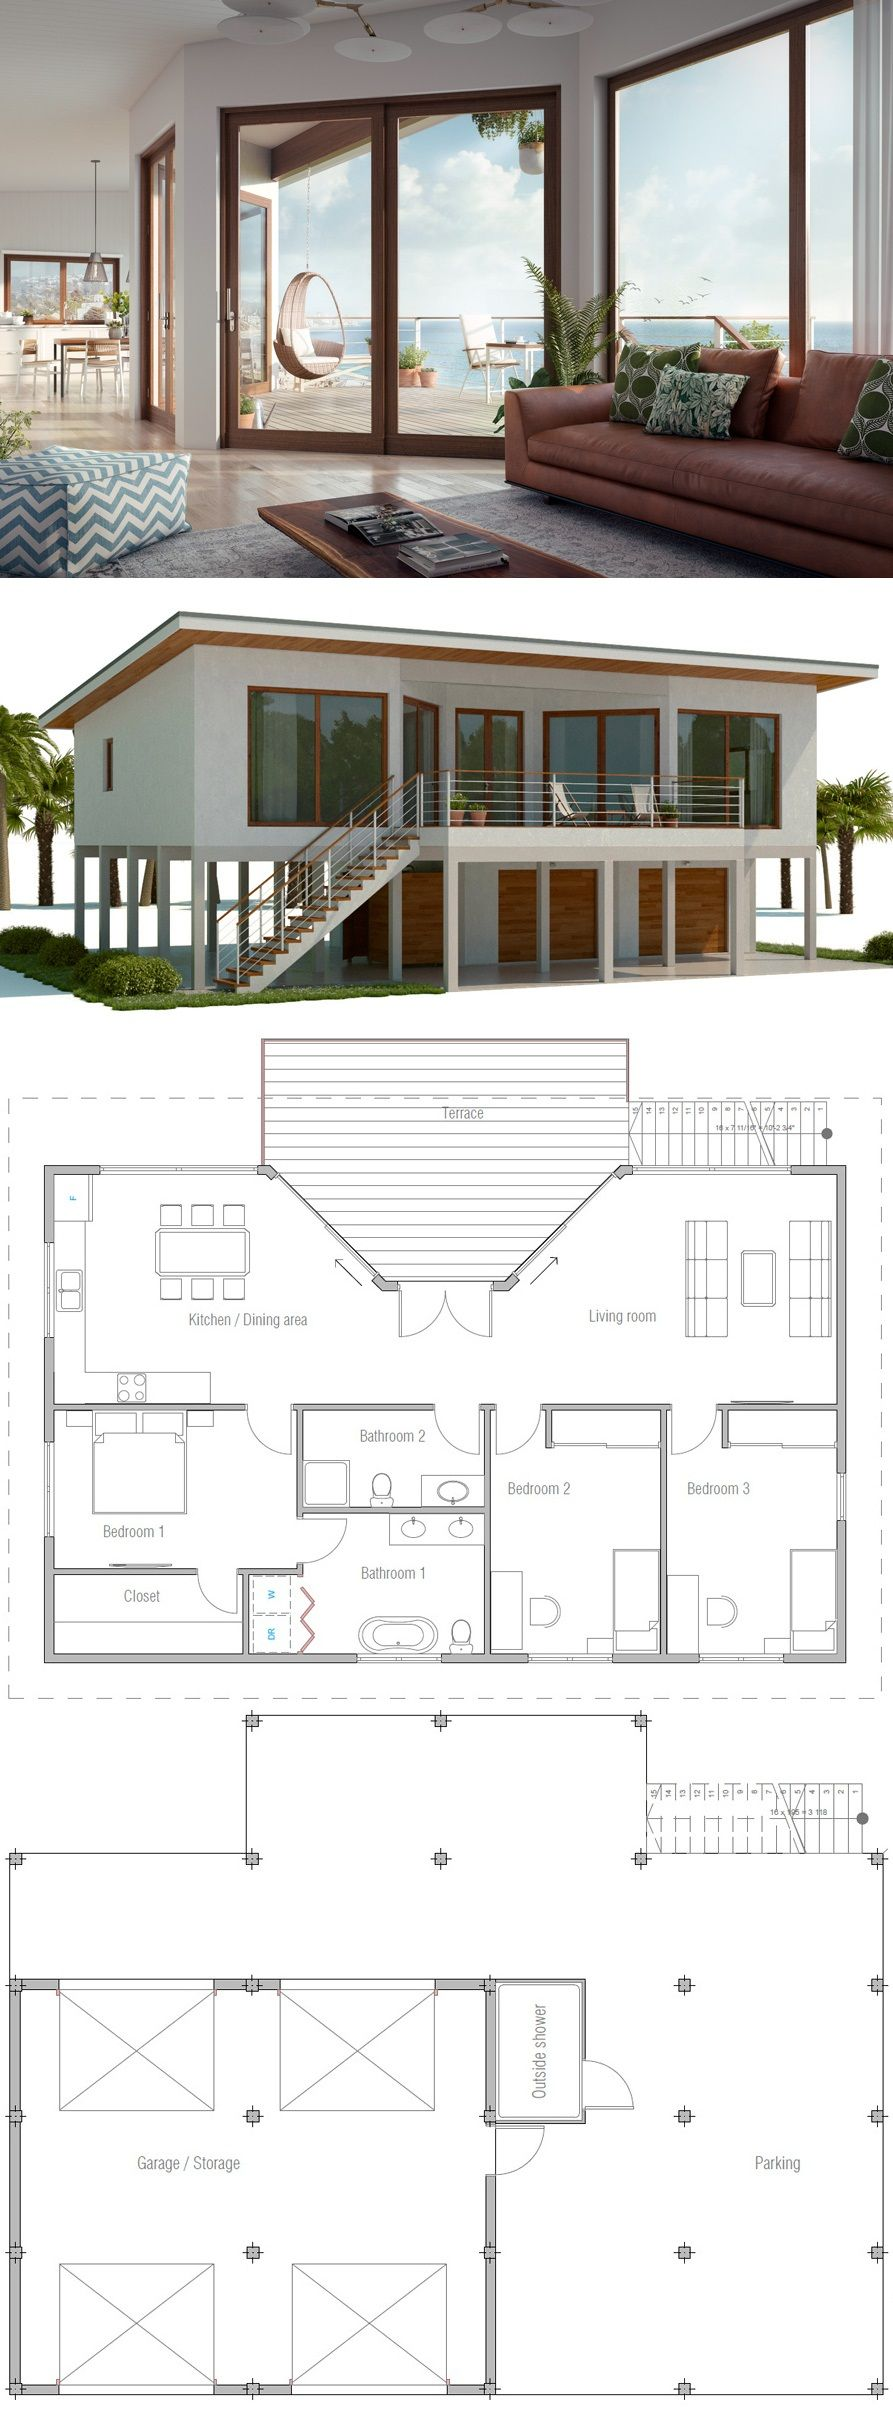 Raised coastal house plan beach house plan house on piers